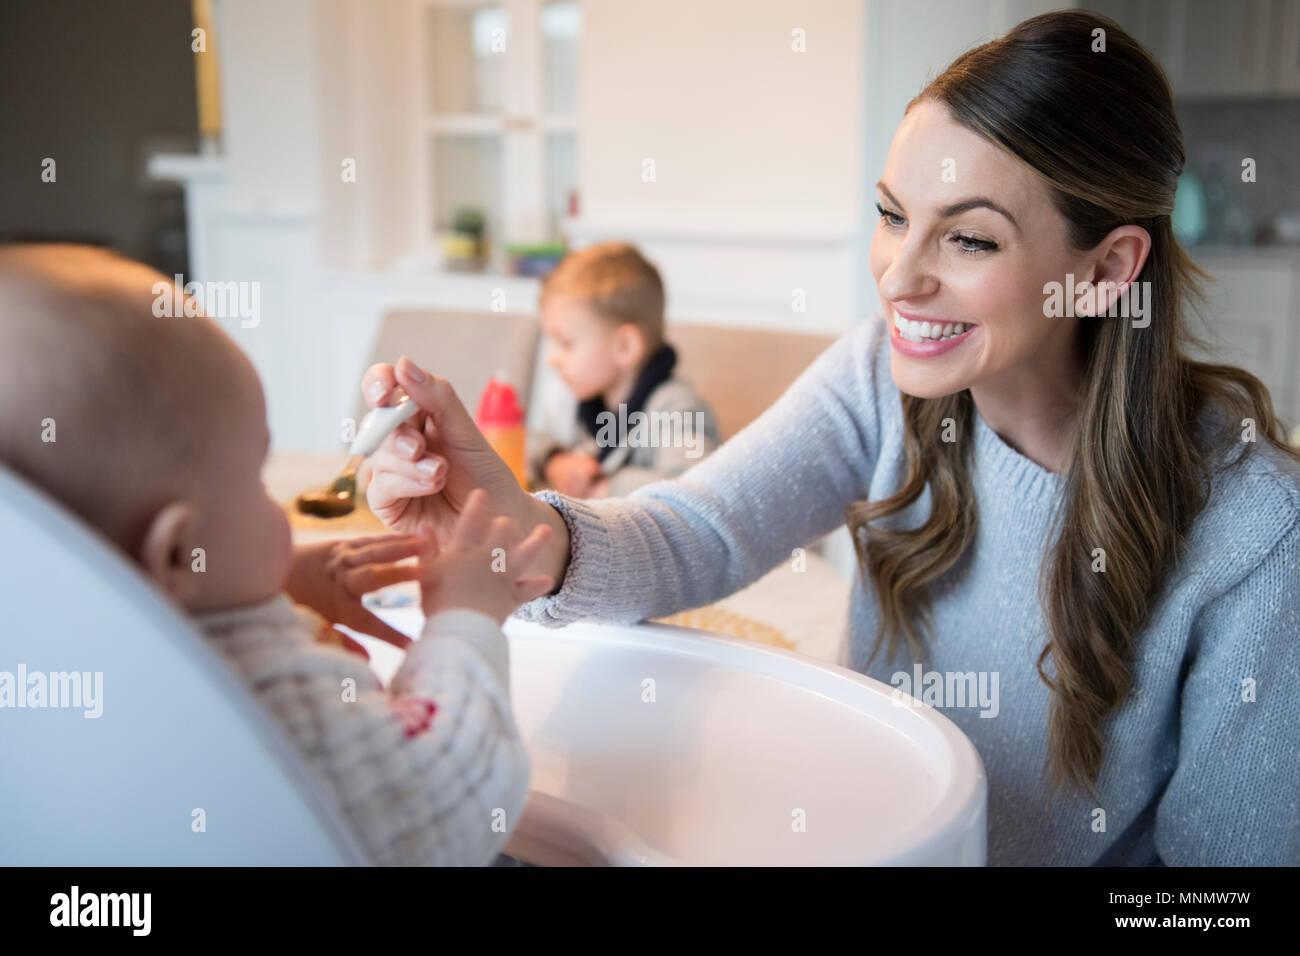 Madre alimentando bebé (18-23 meses) Imagen De Stock